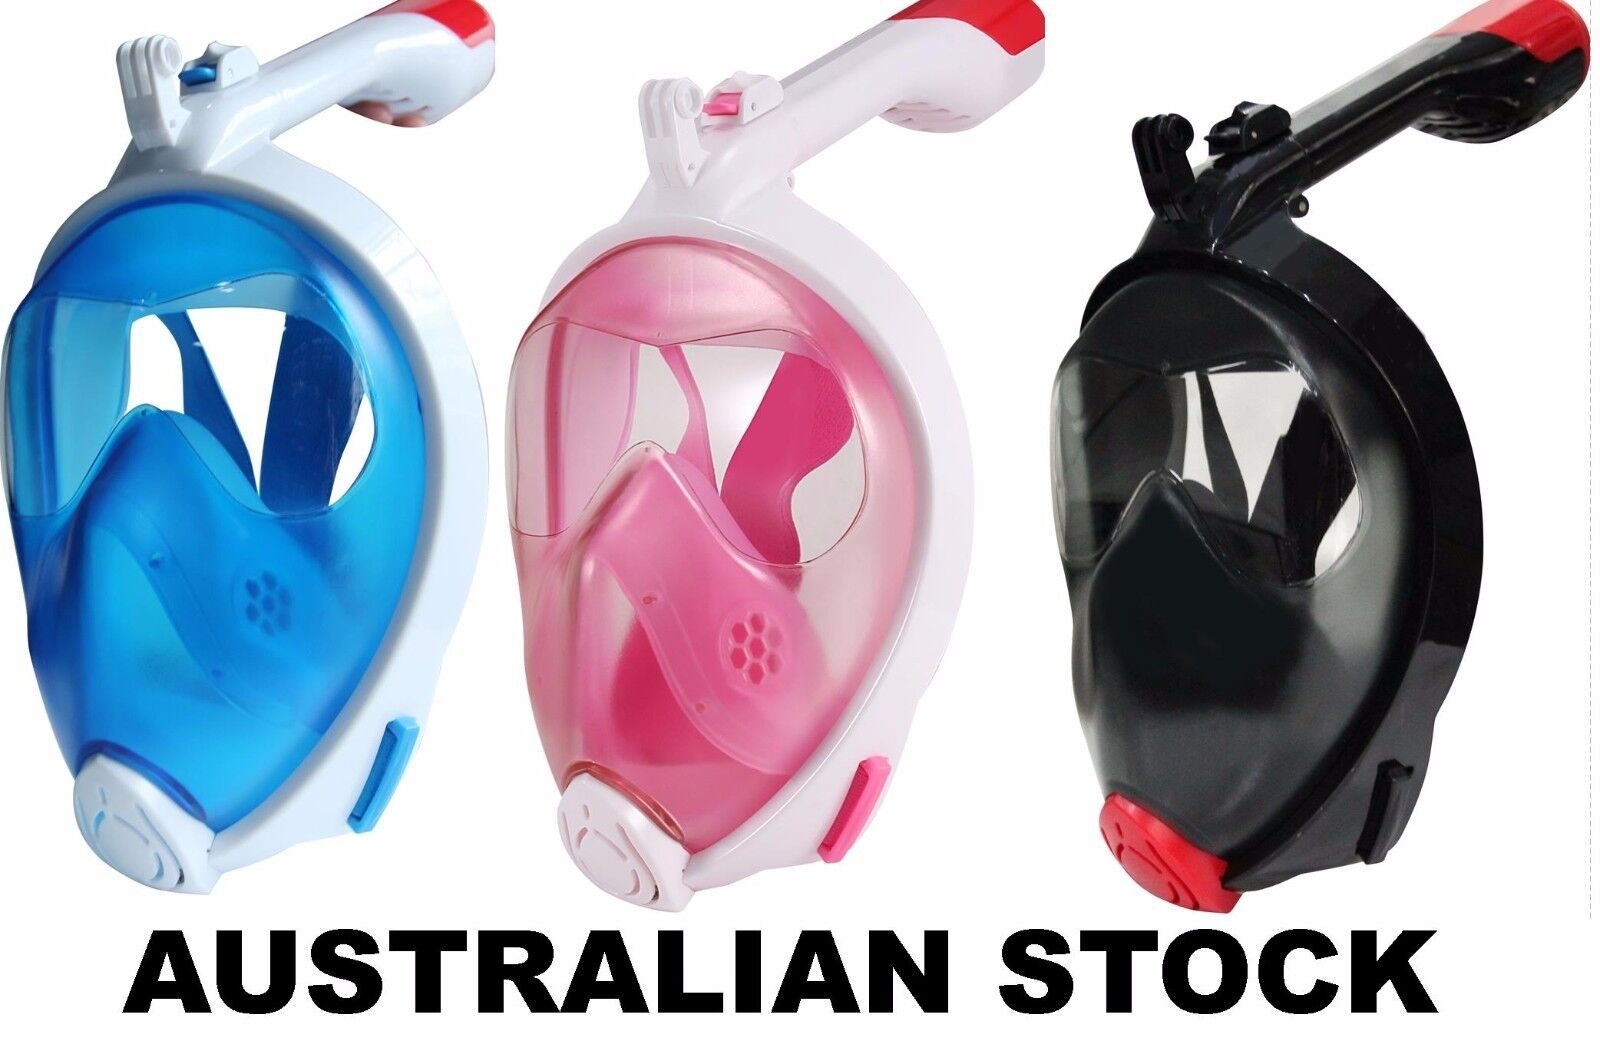 Full Face Snorkeling Snorkel Mask Diving Breather By Nose GoPro Mount Australia